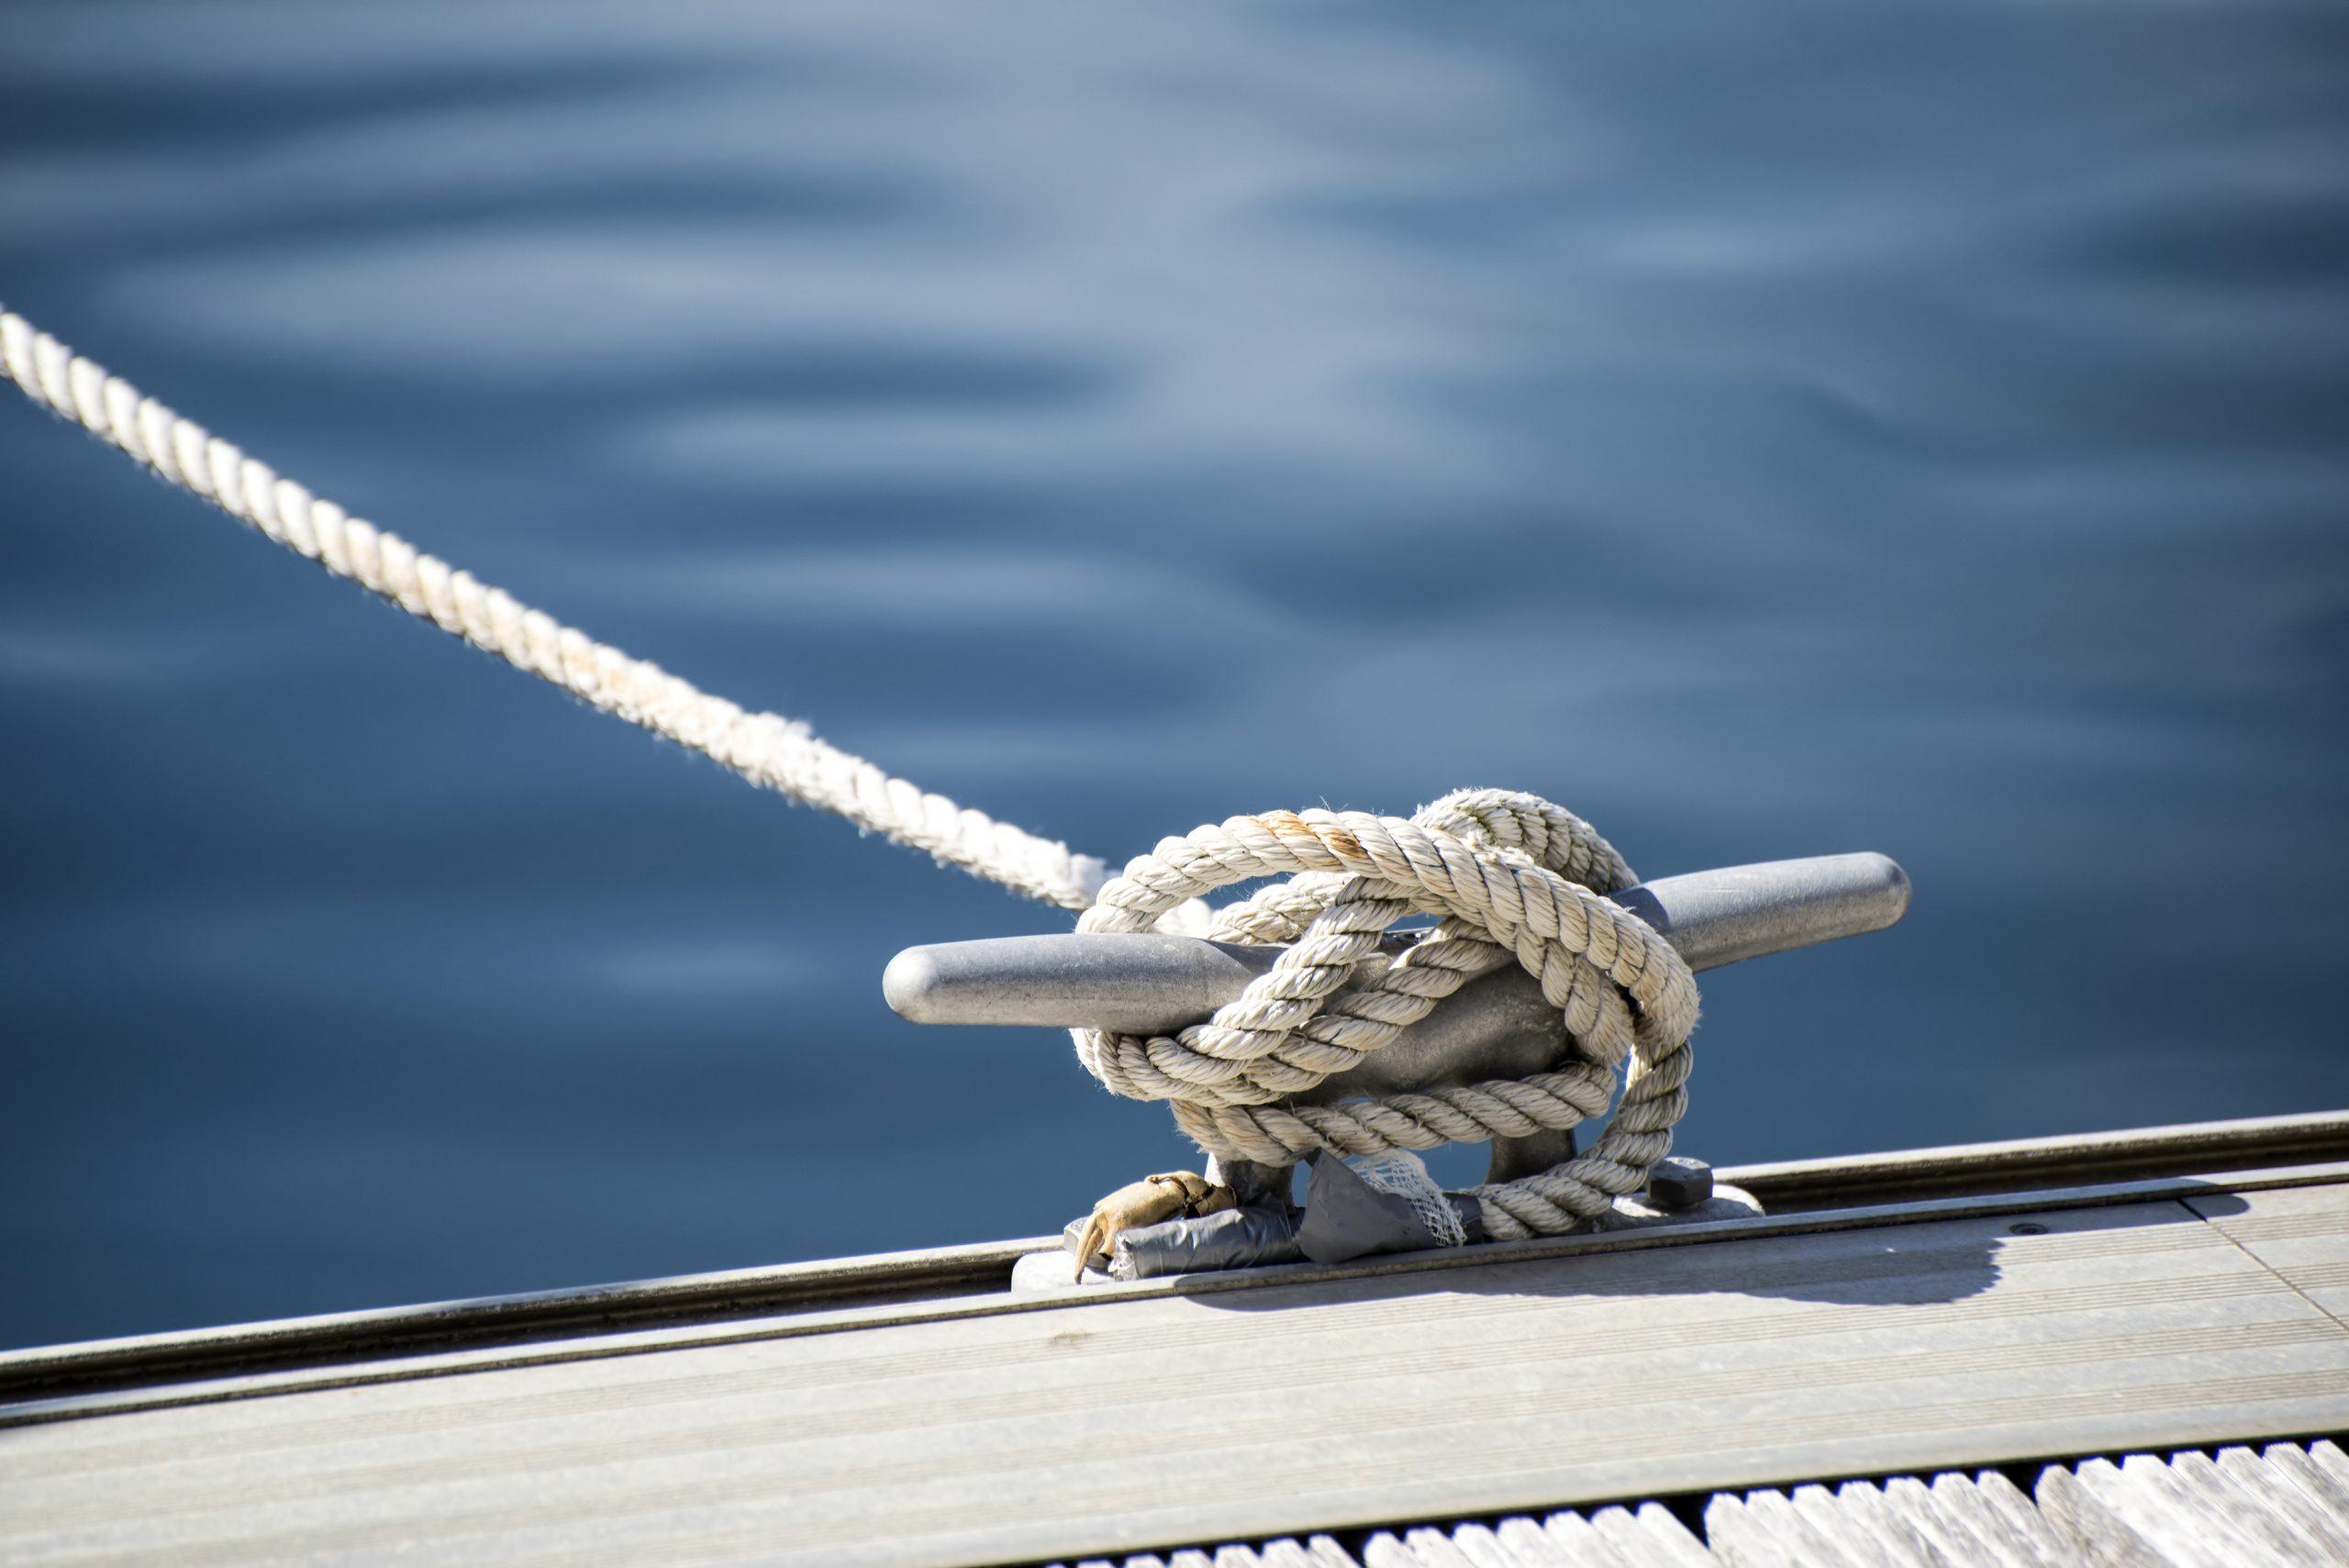 Yacht rope